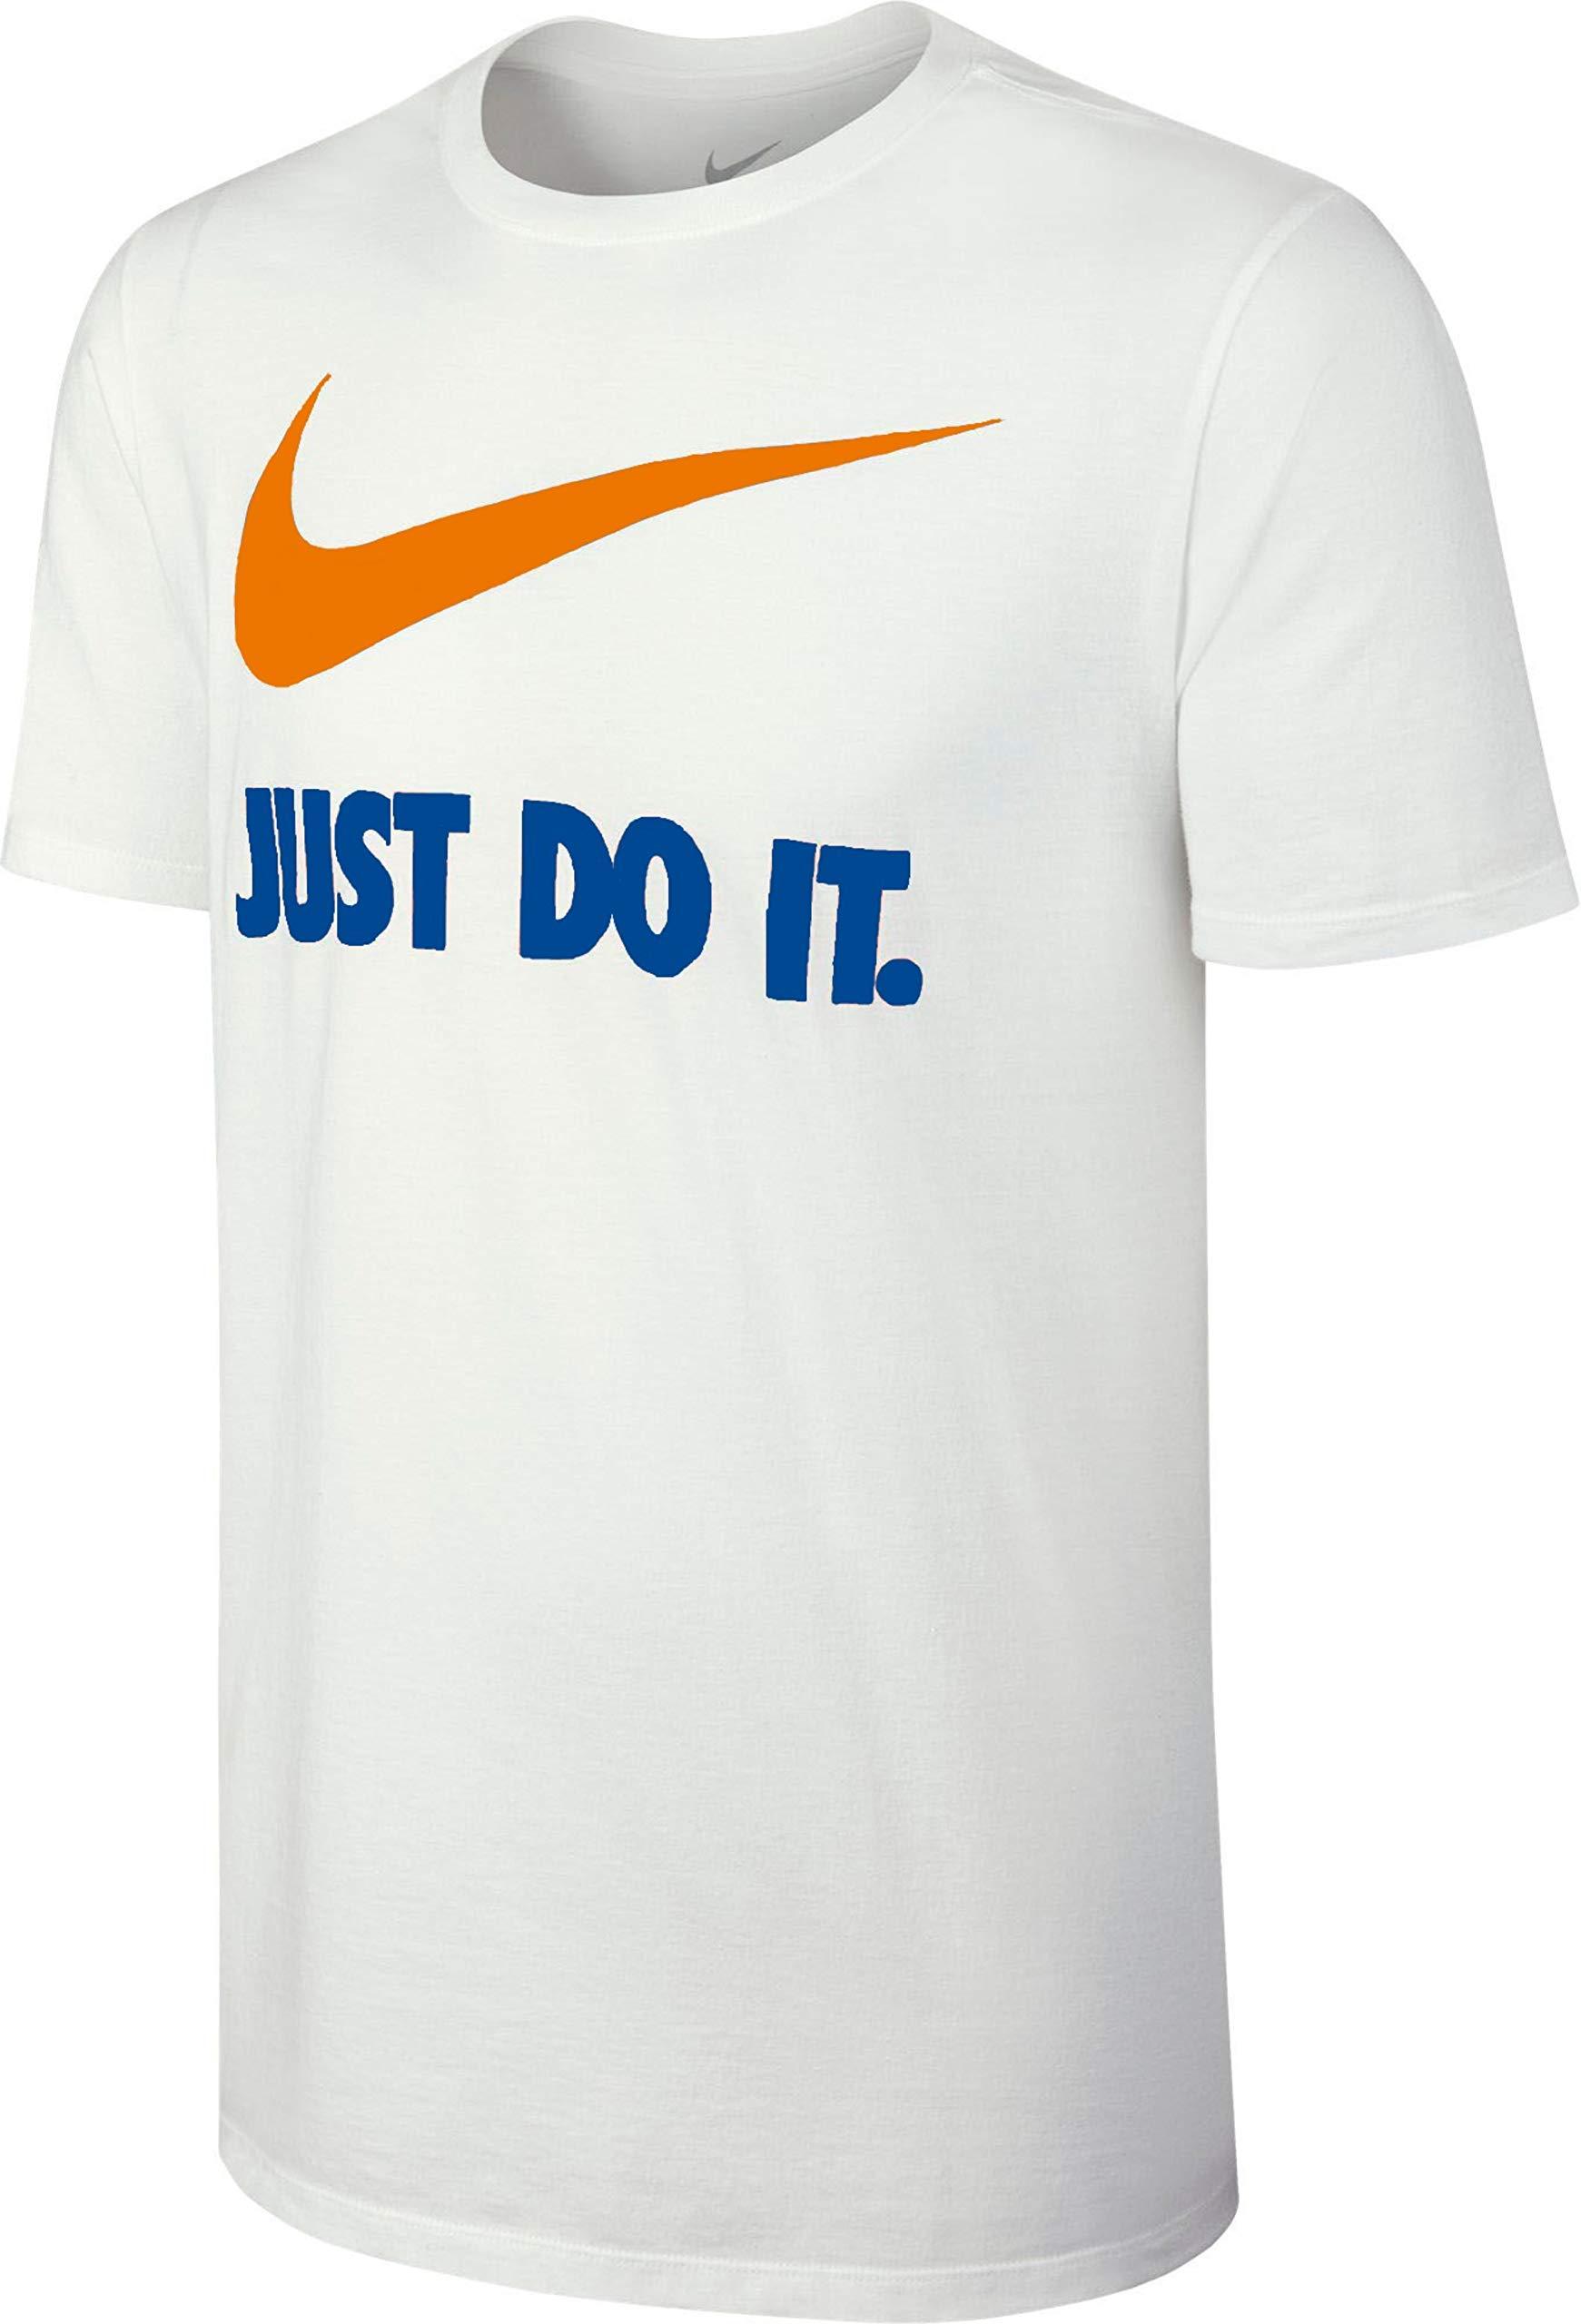 Nike Men's Sportswear New Just Do It Swoosh Tee … (Small, White/Orange/Royal Blue/Royal)